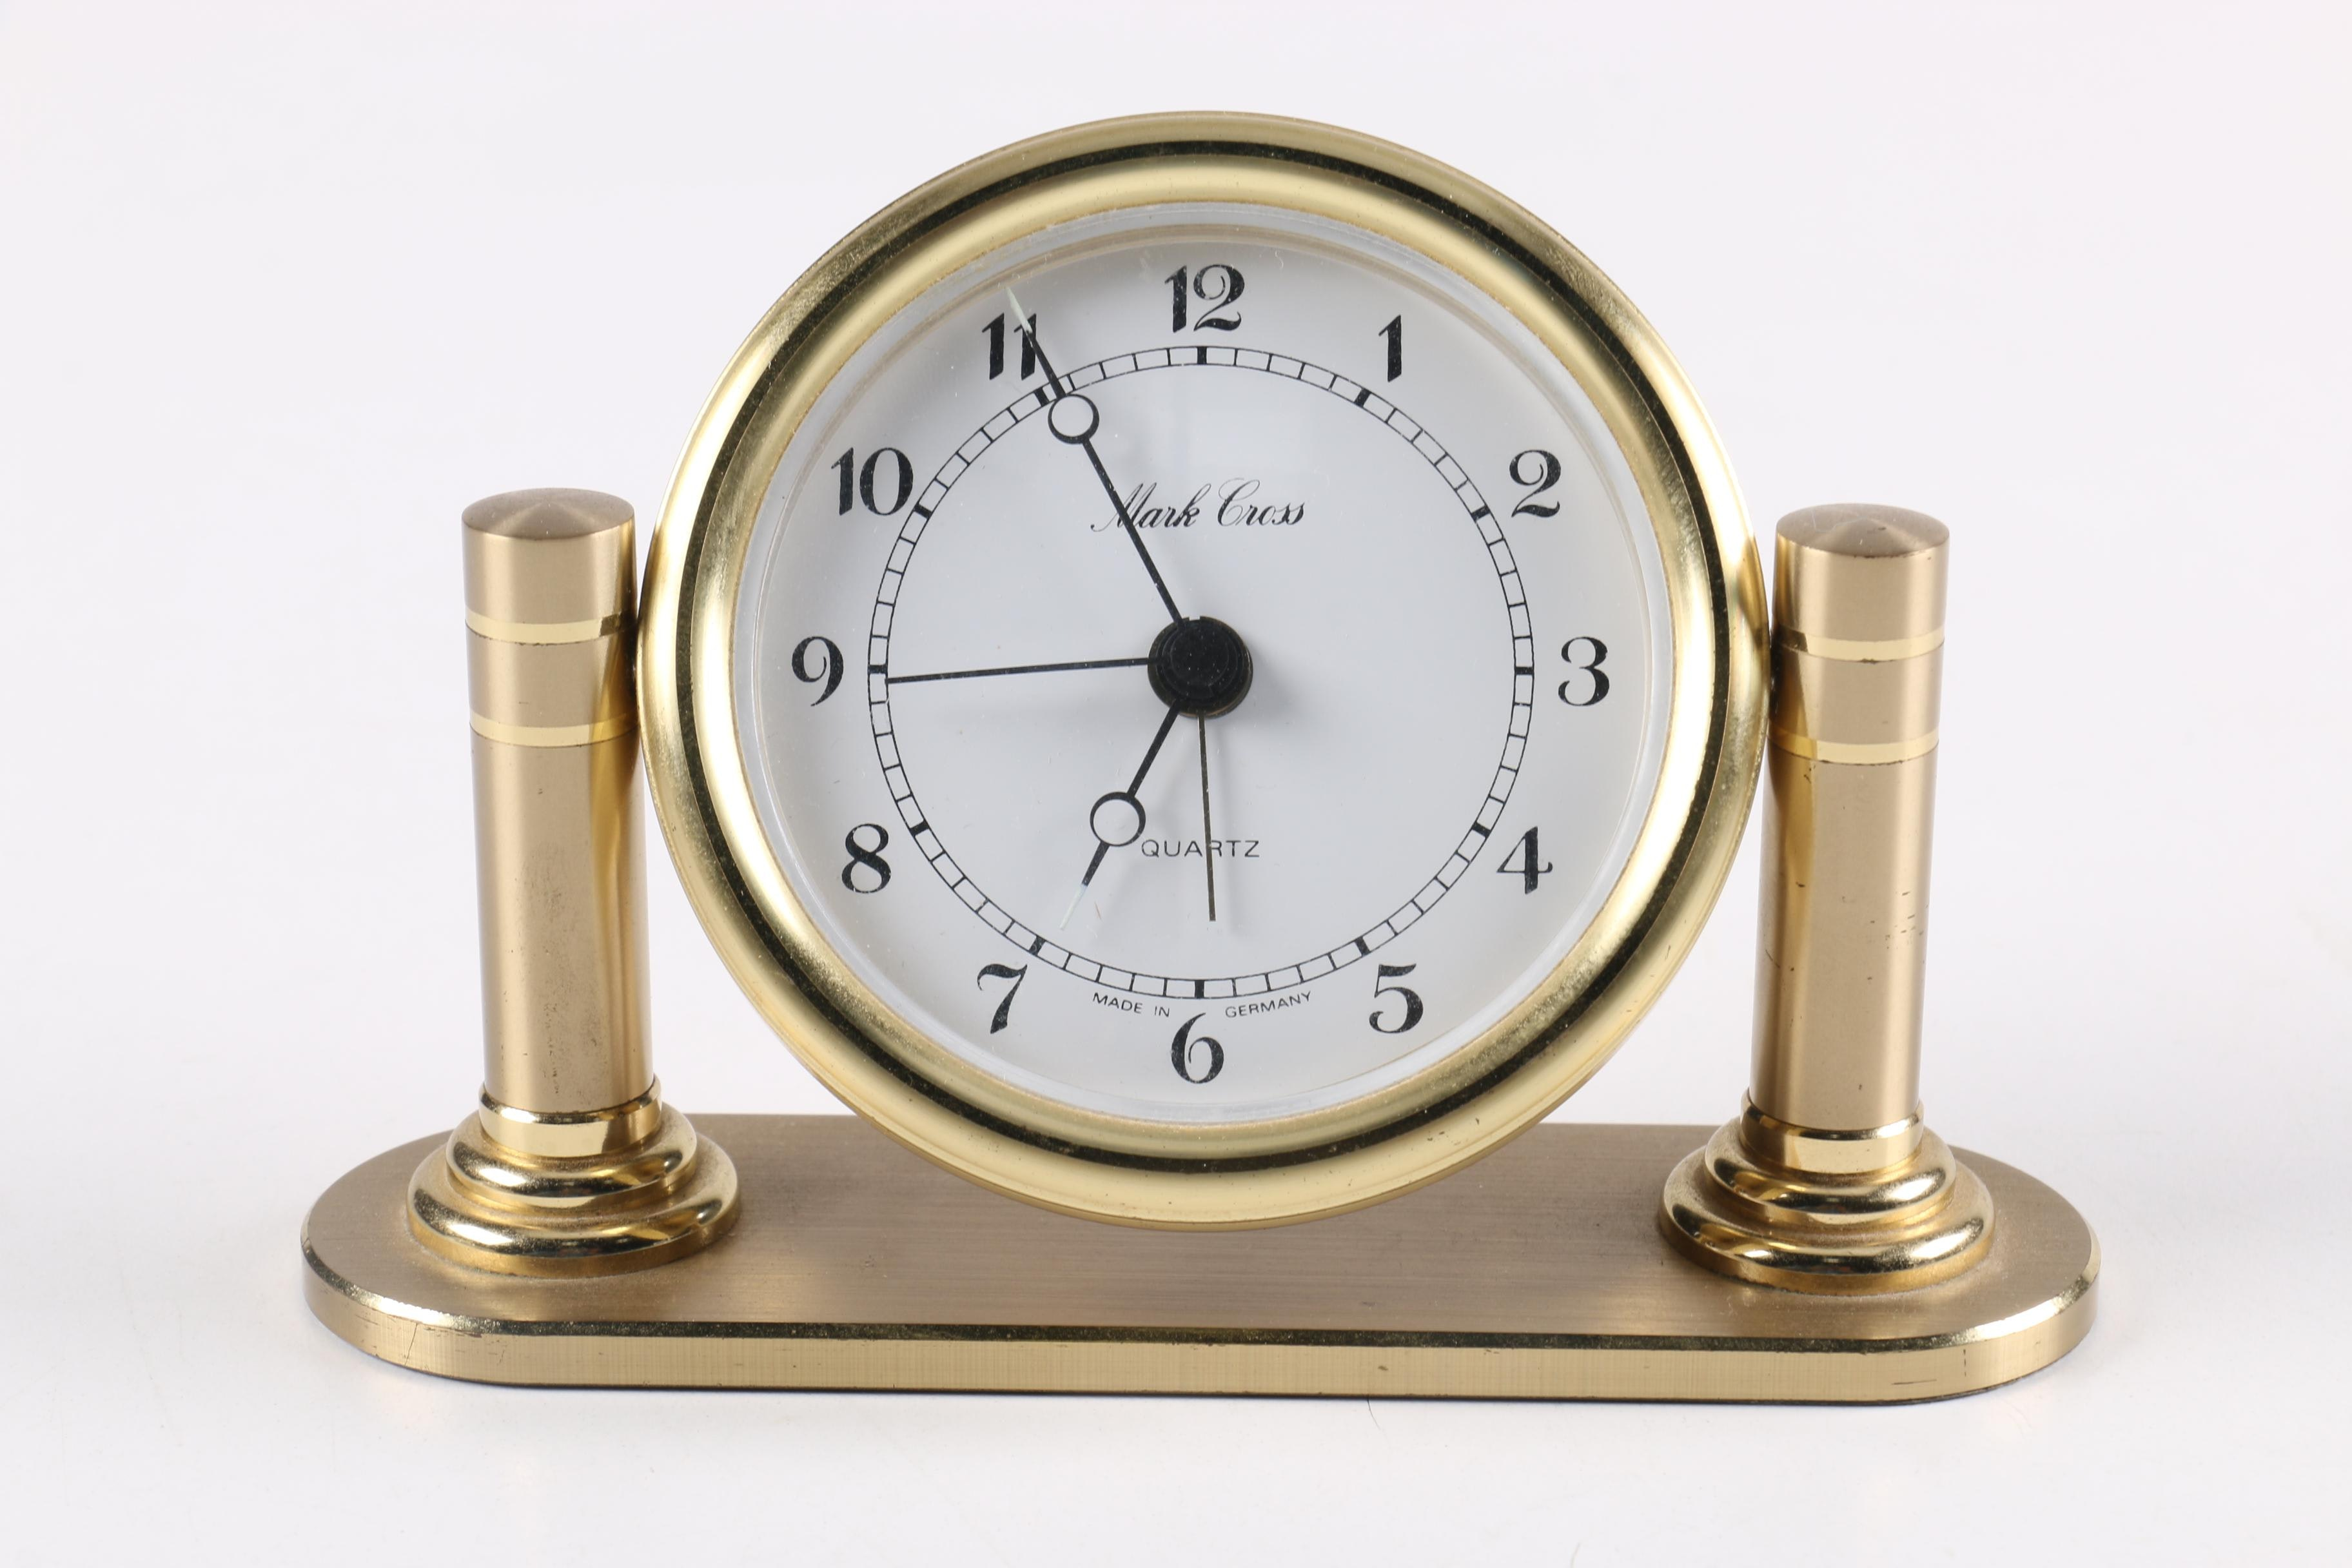 Mark Cross German Made Mantle Clock